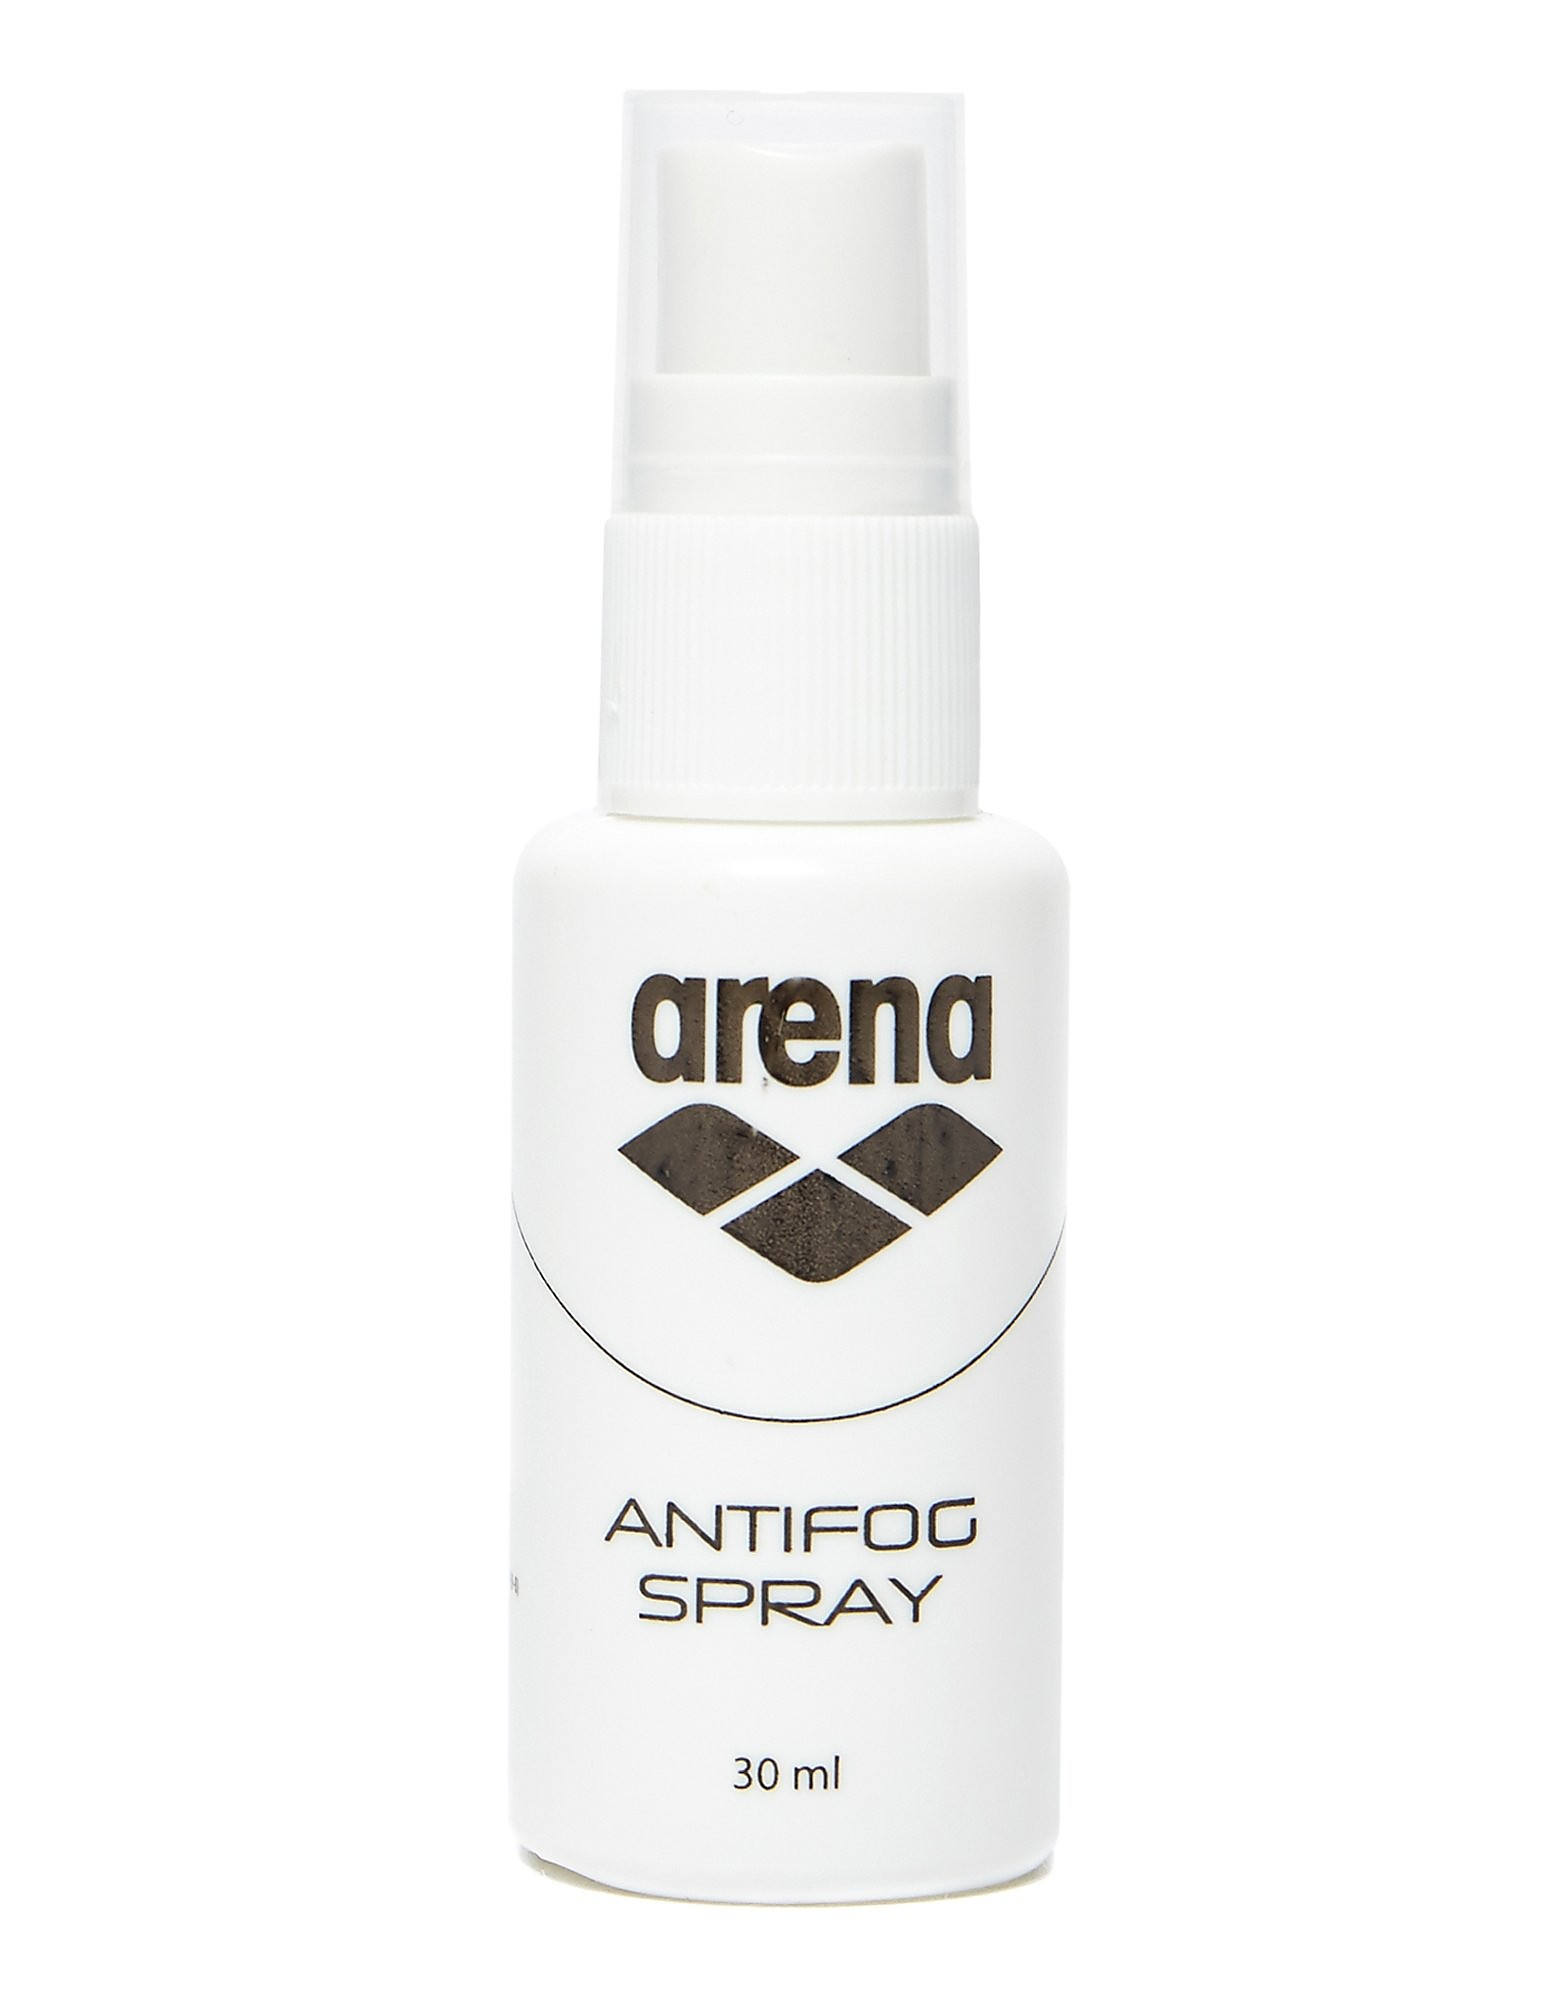 Arena Anti Fog Spray